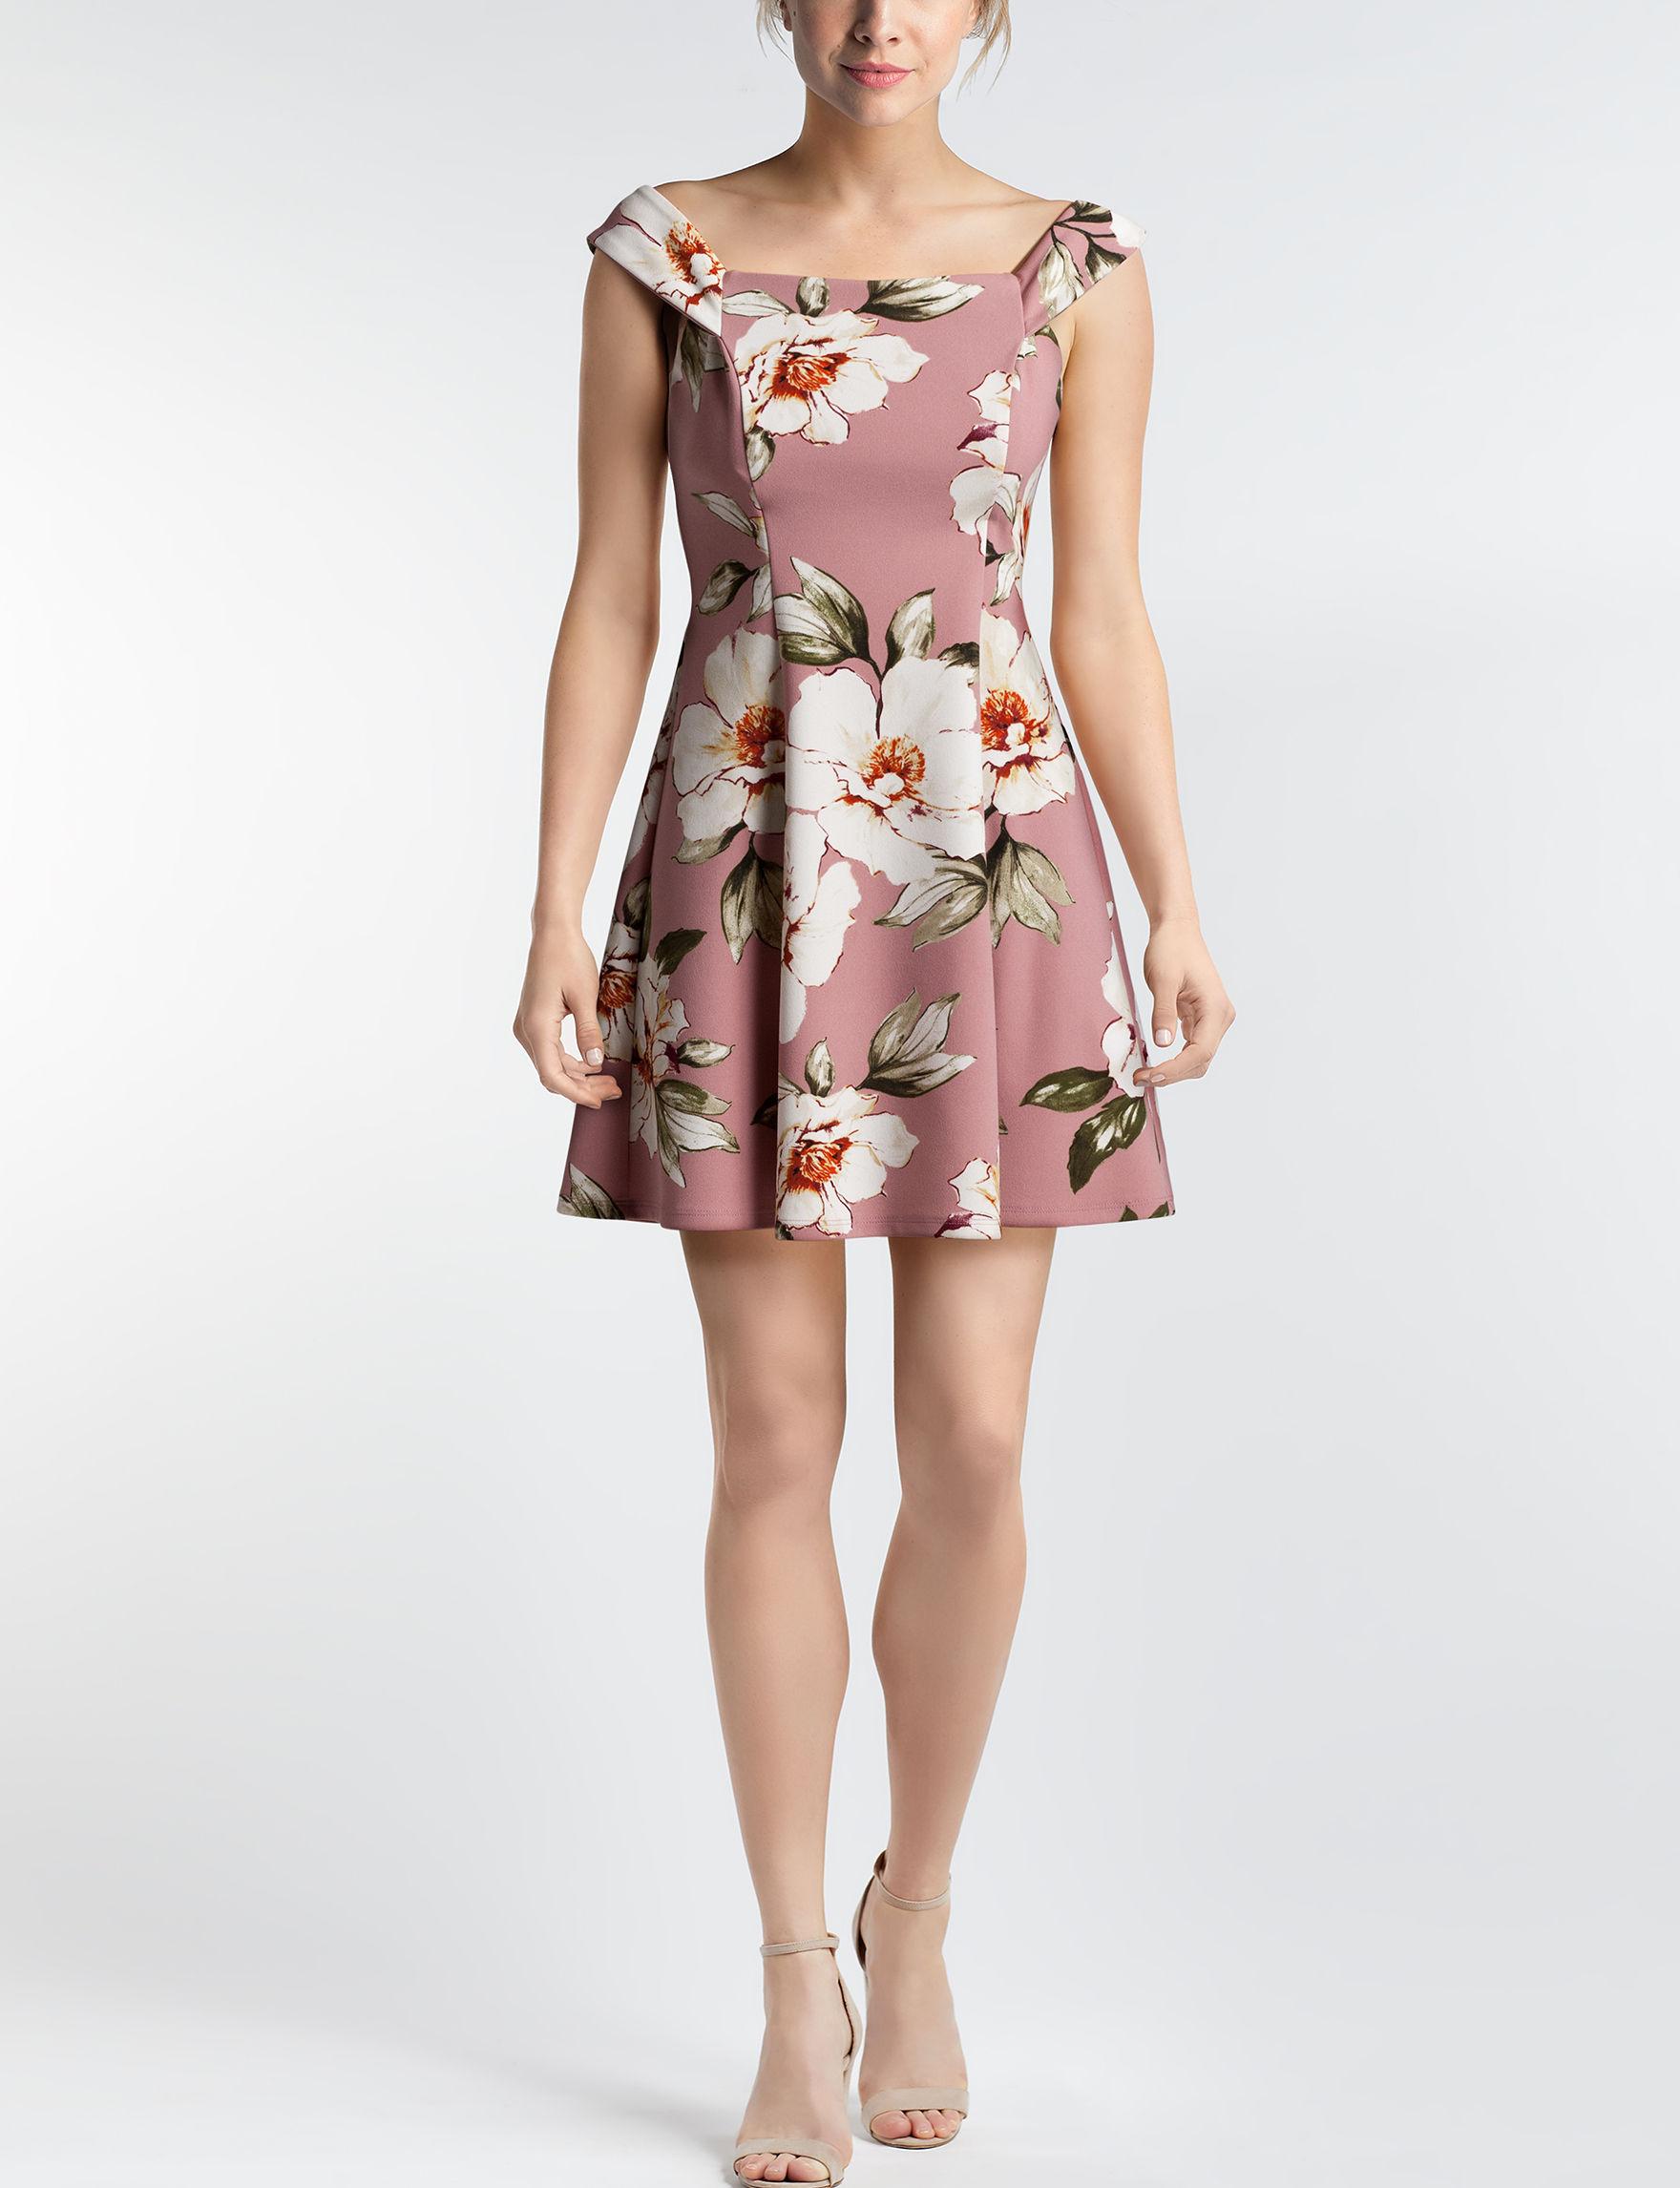 Speechless Mauve Cocktail & Party Fit & Flare Dresses